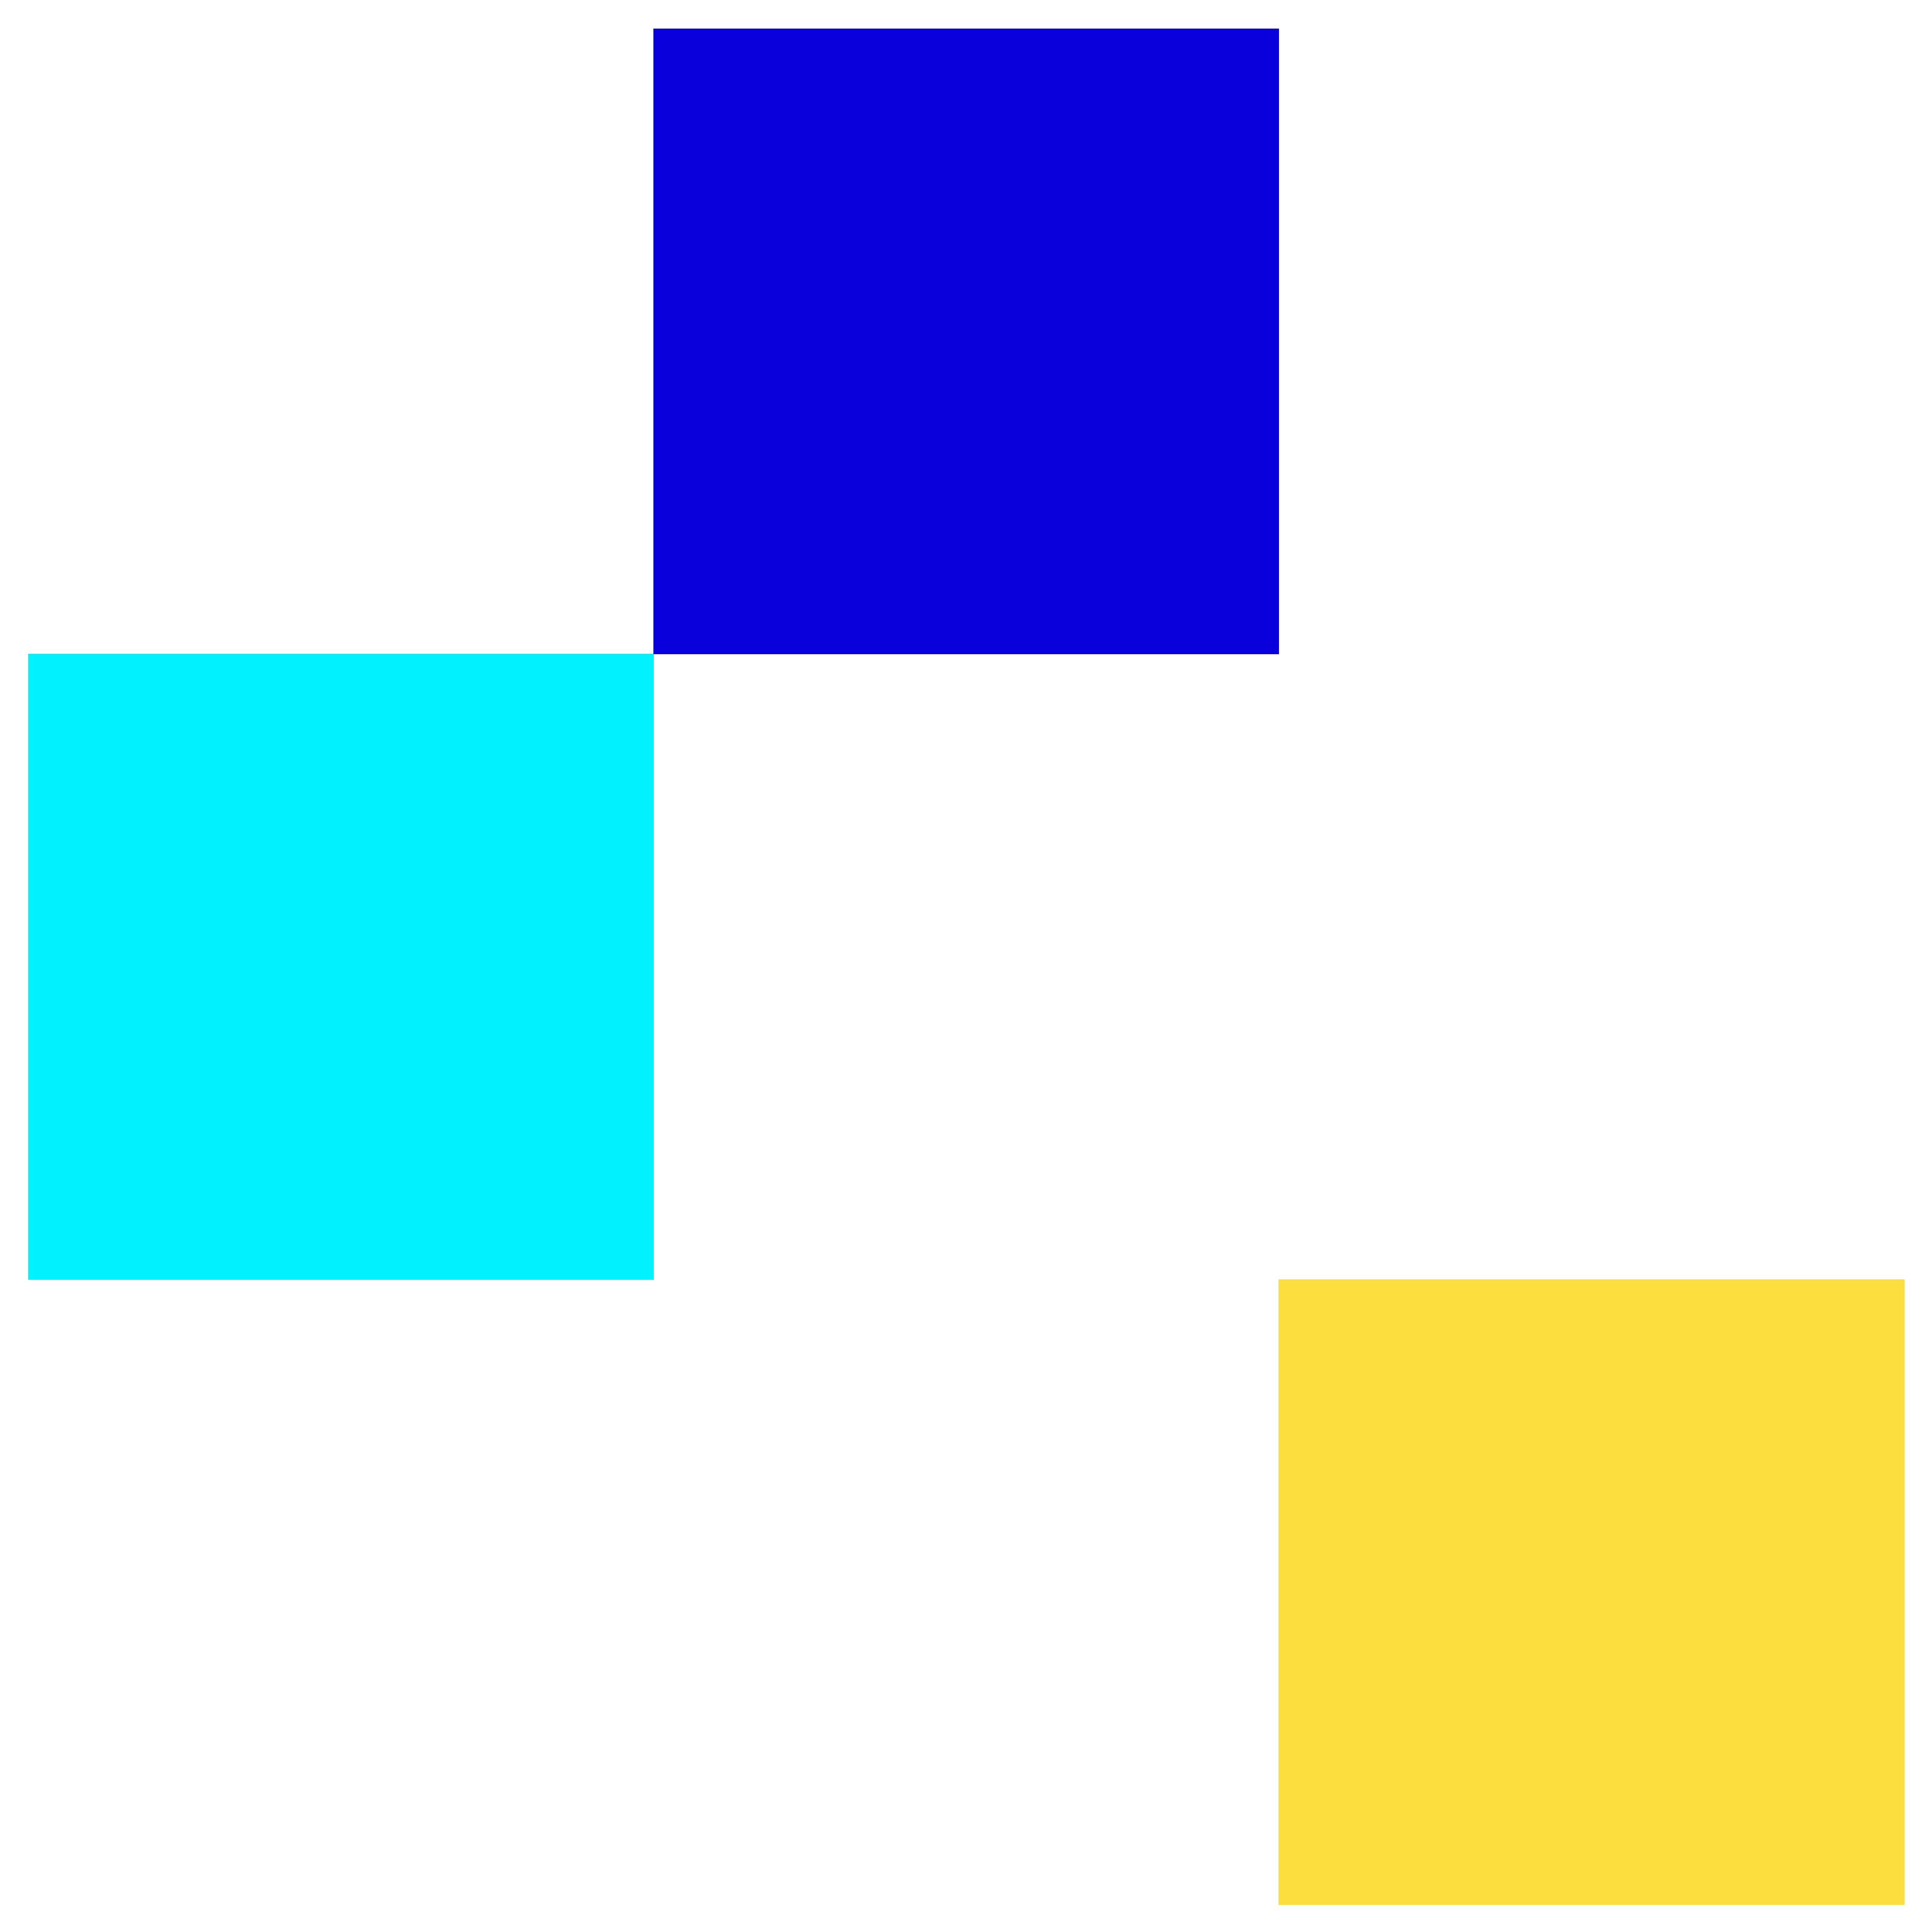 Pixl Innovations, a chatbot developer